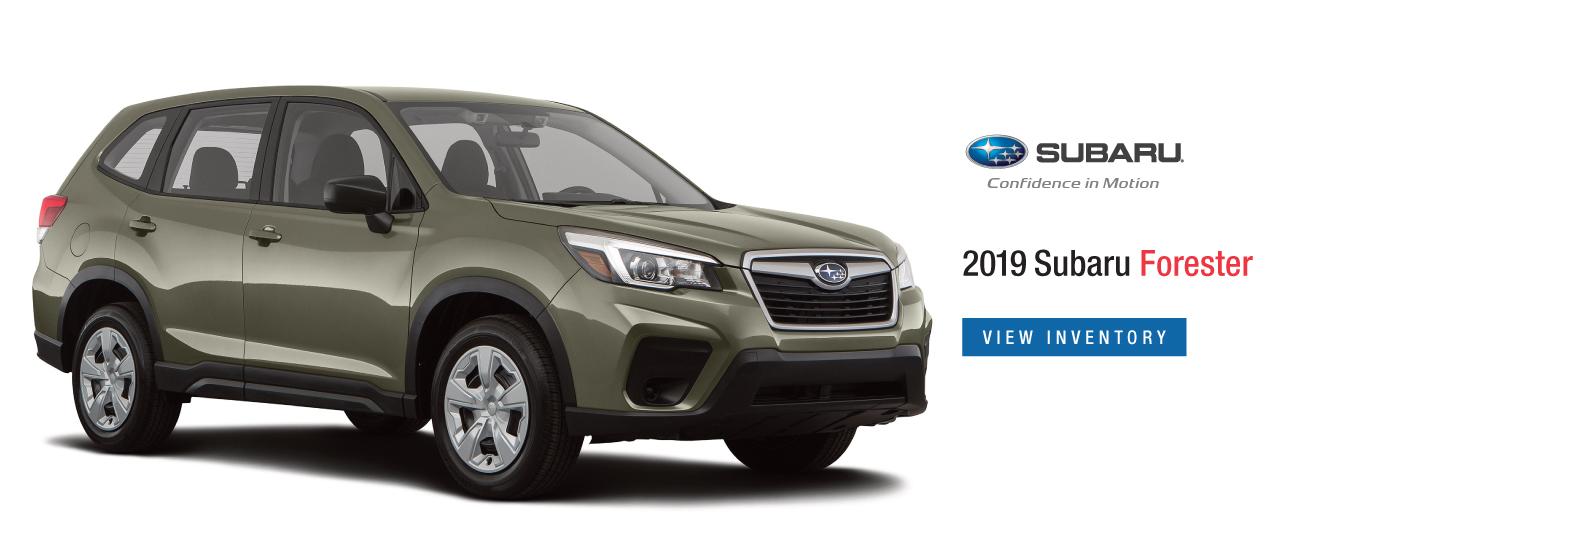 Subaru 0 Financing >> Subaru Lease Specials Subaru Finance Offers Near